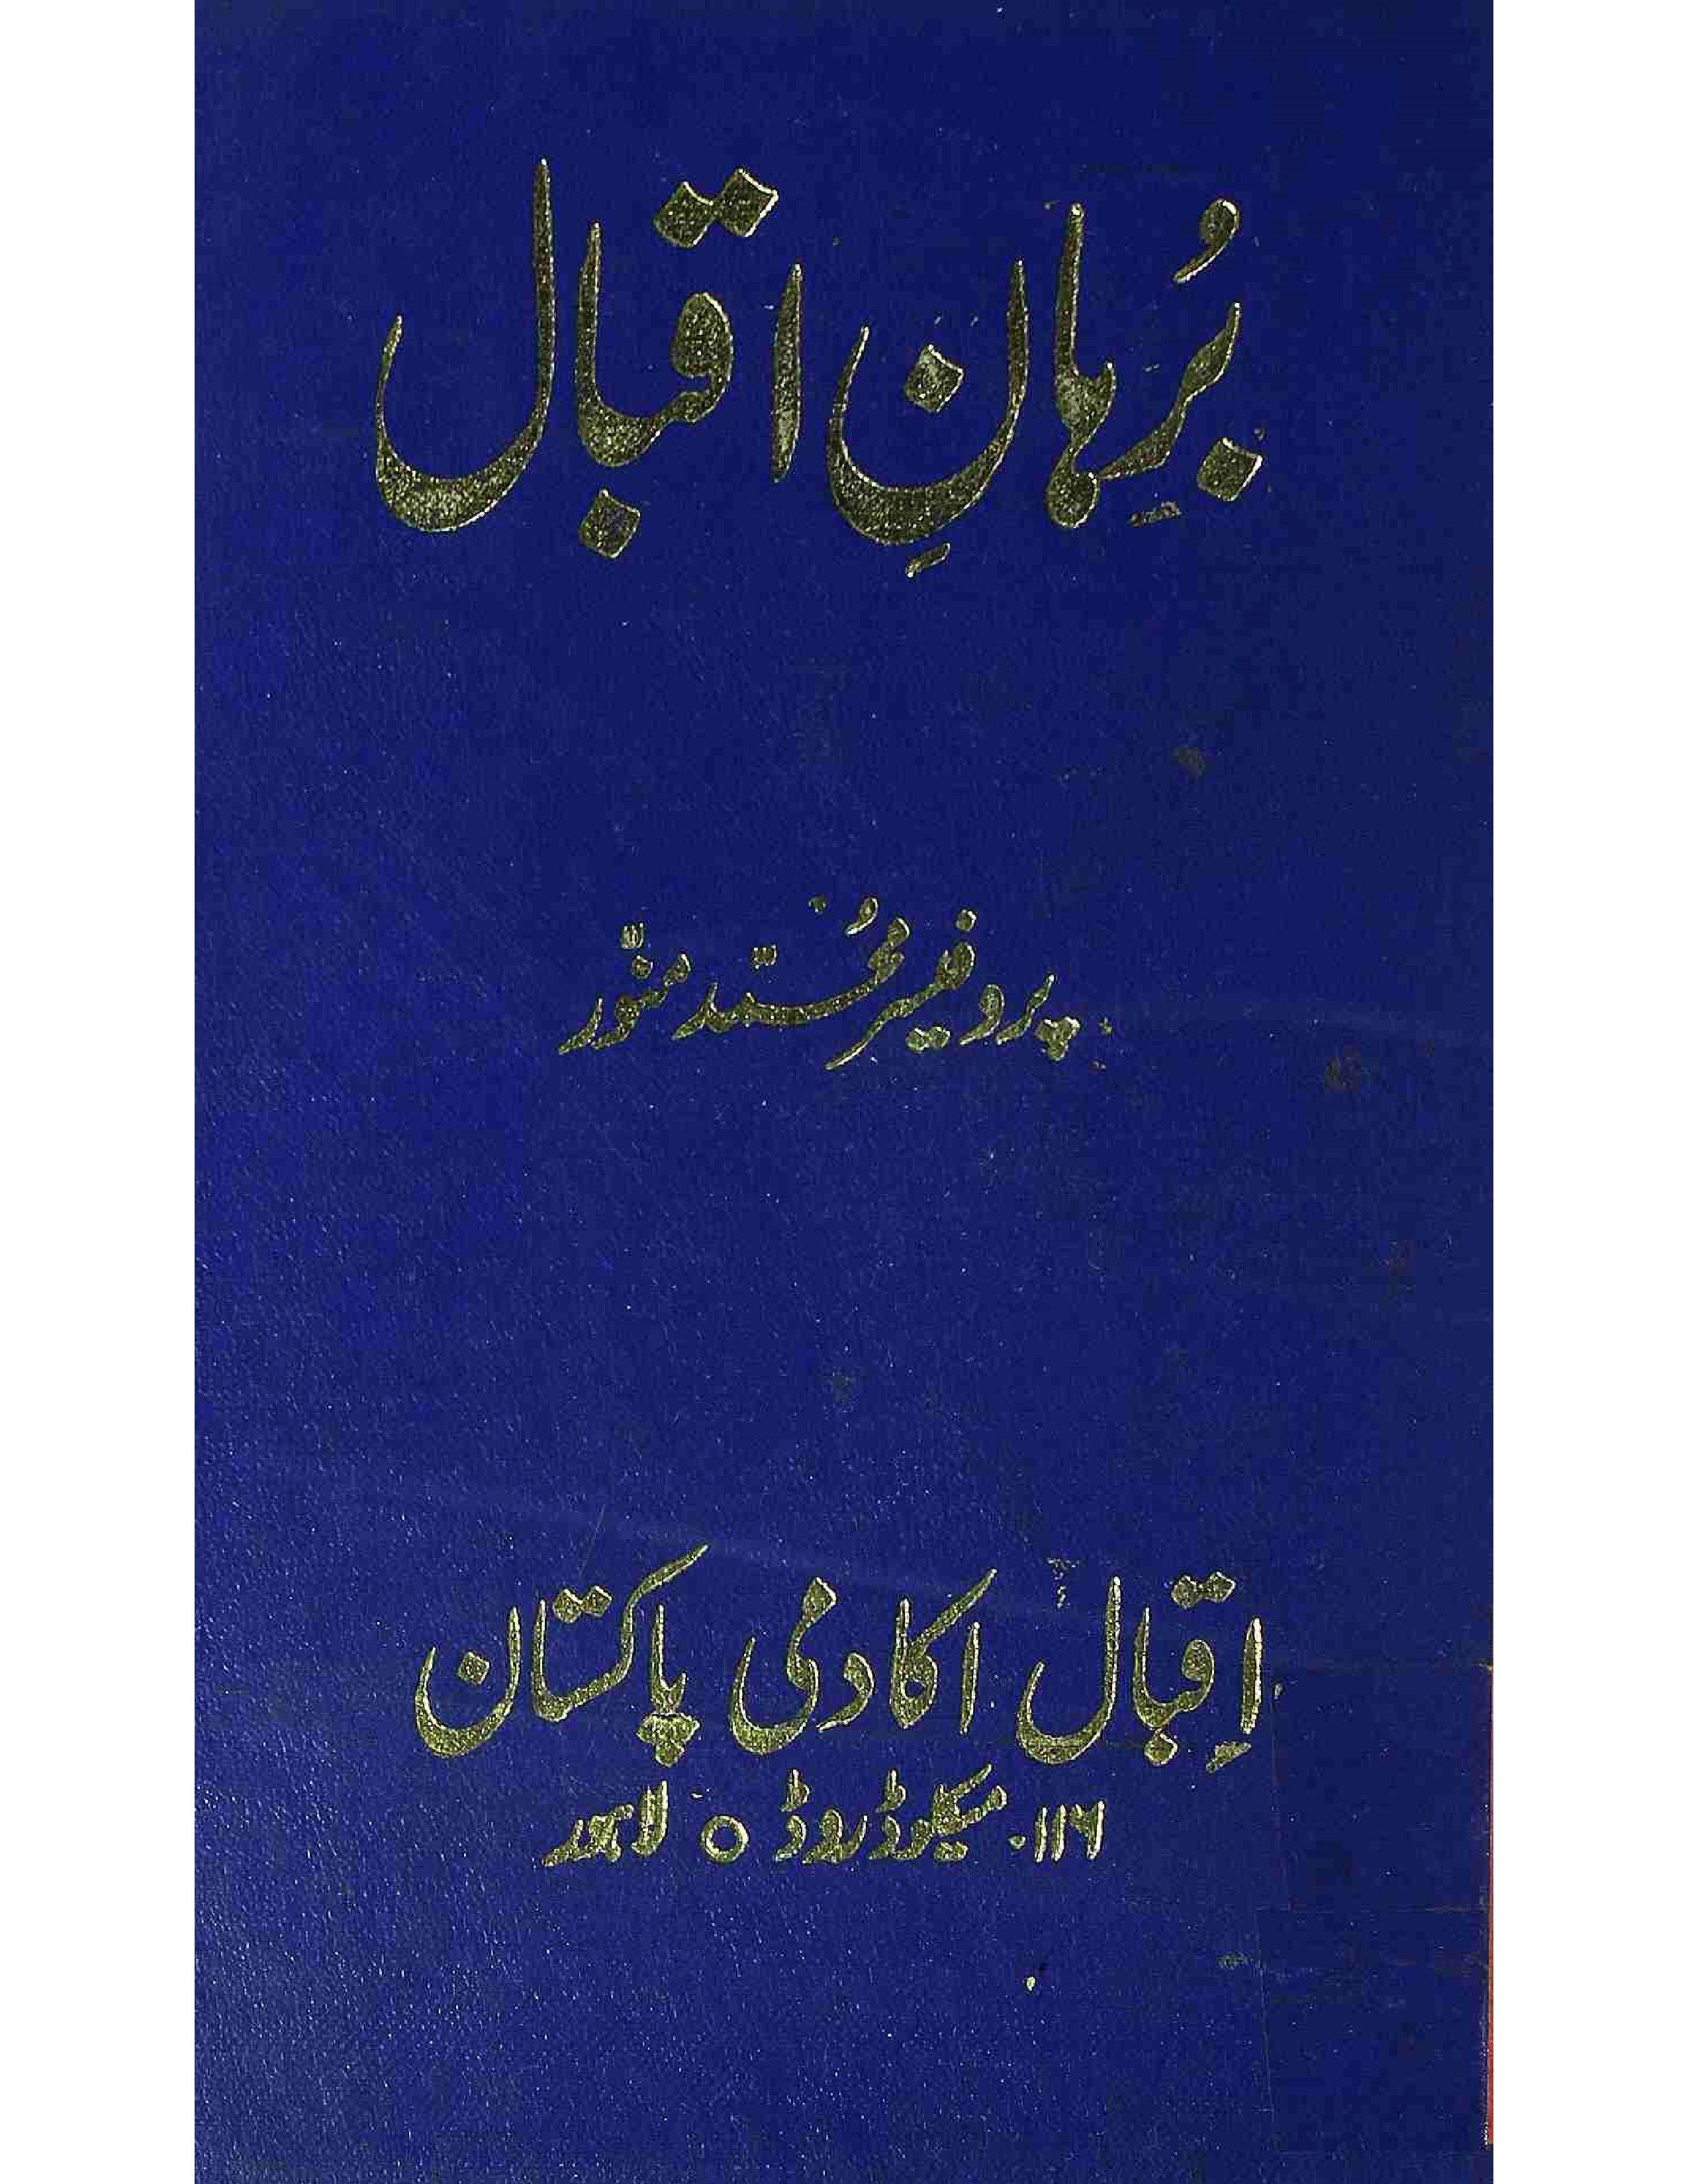 Burhaan-e-Iqbal